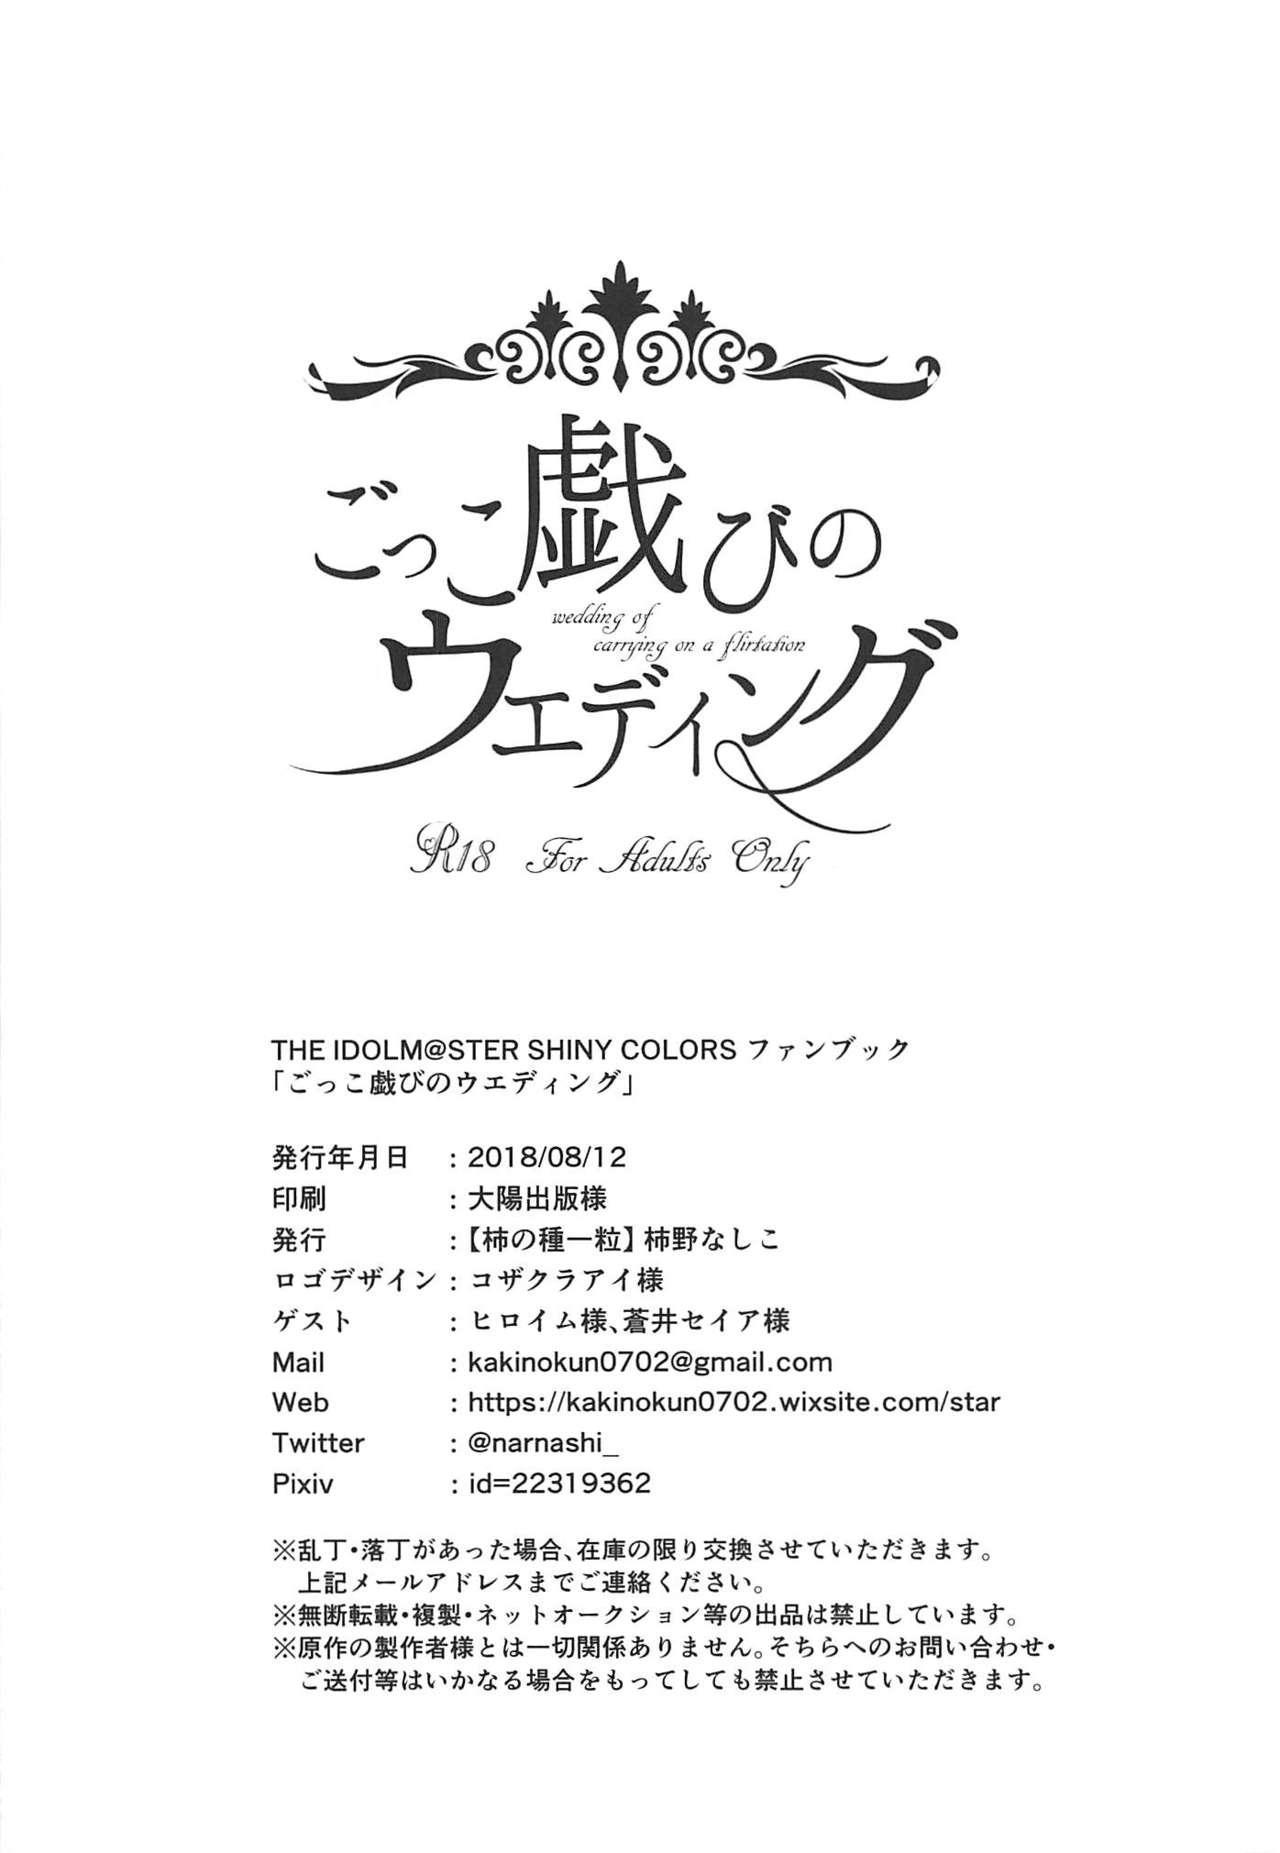 Gokko Asobi no Wedding - wedding of carrying on a flirtation 24